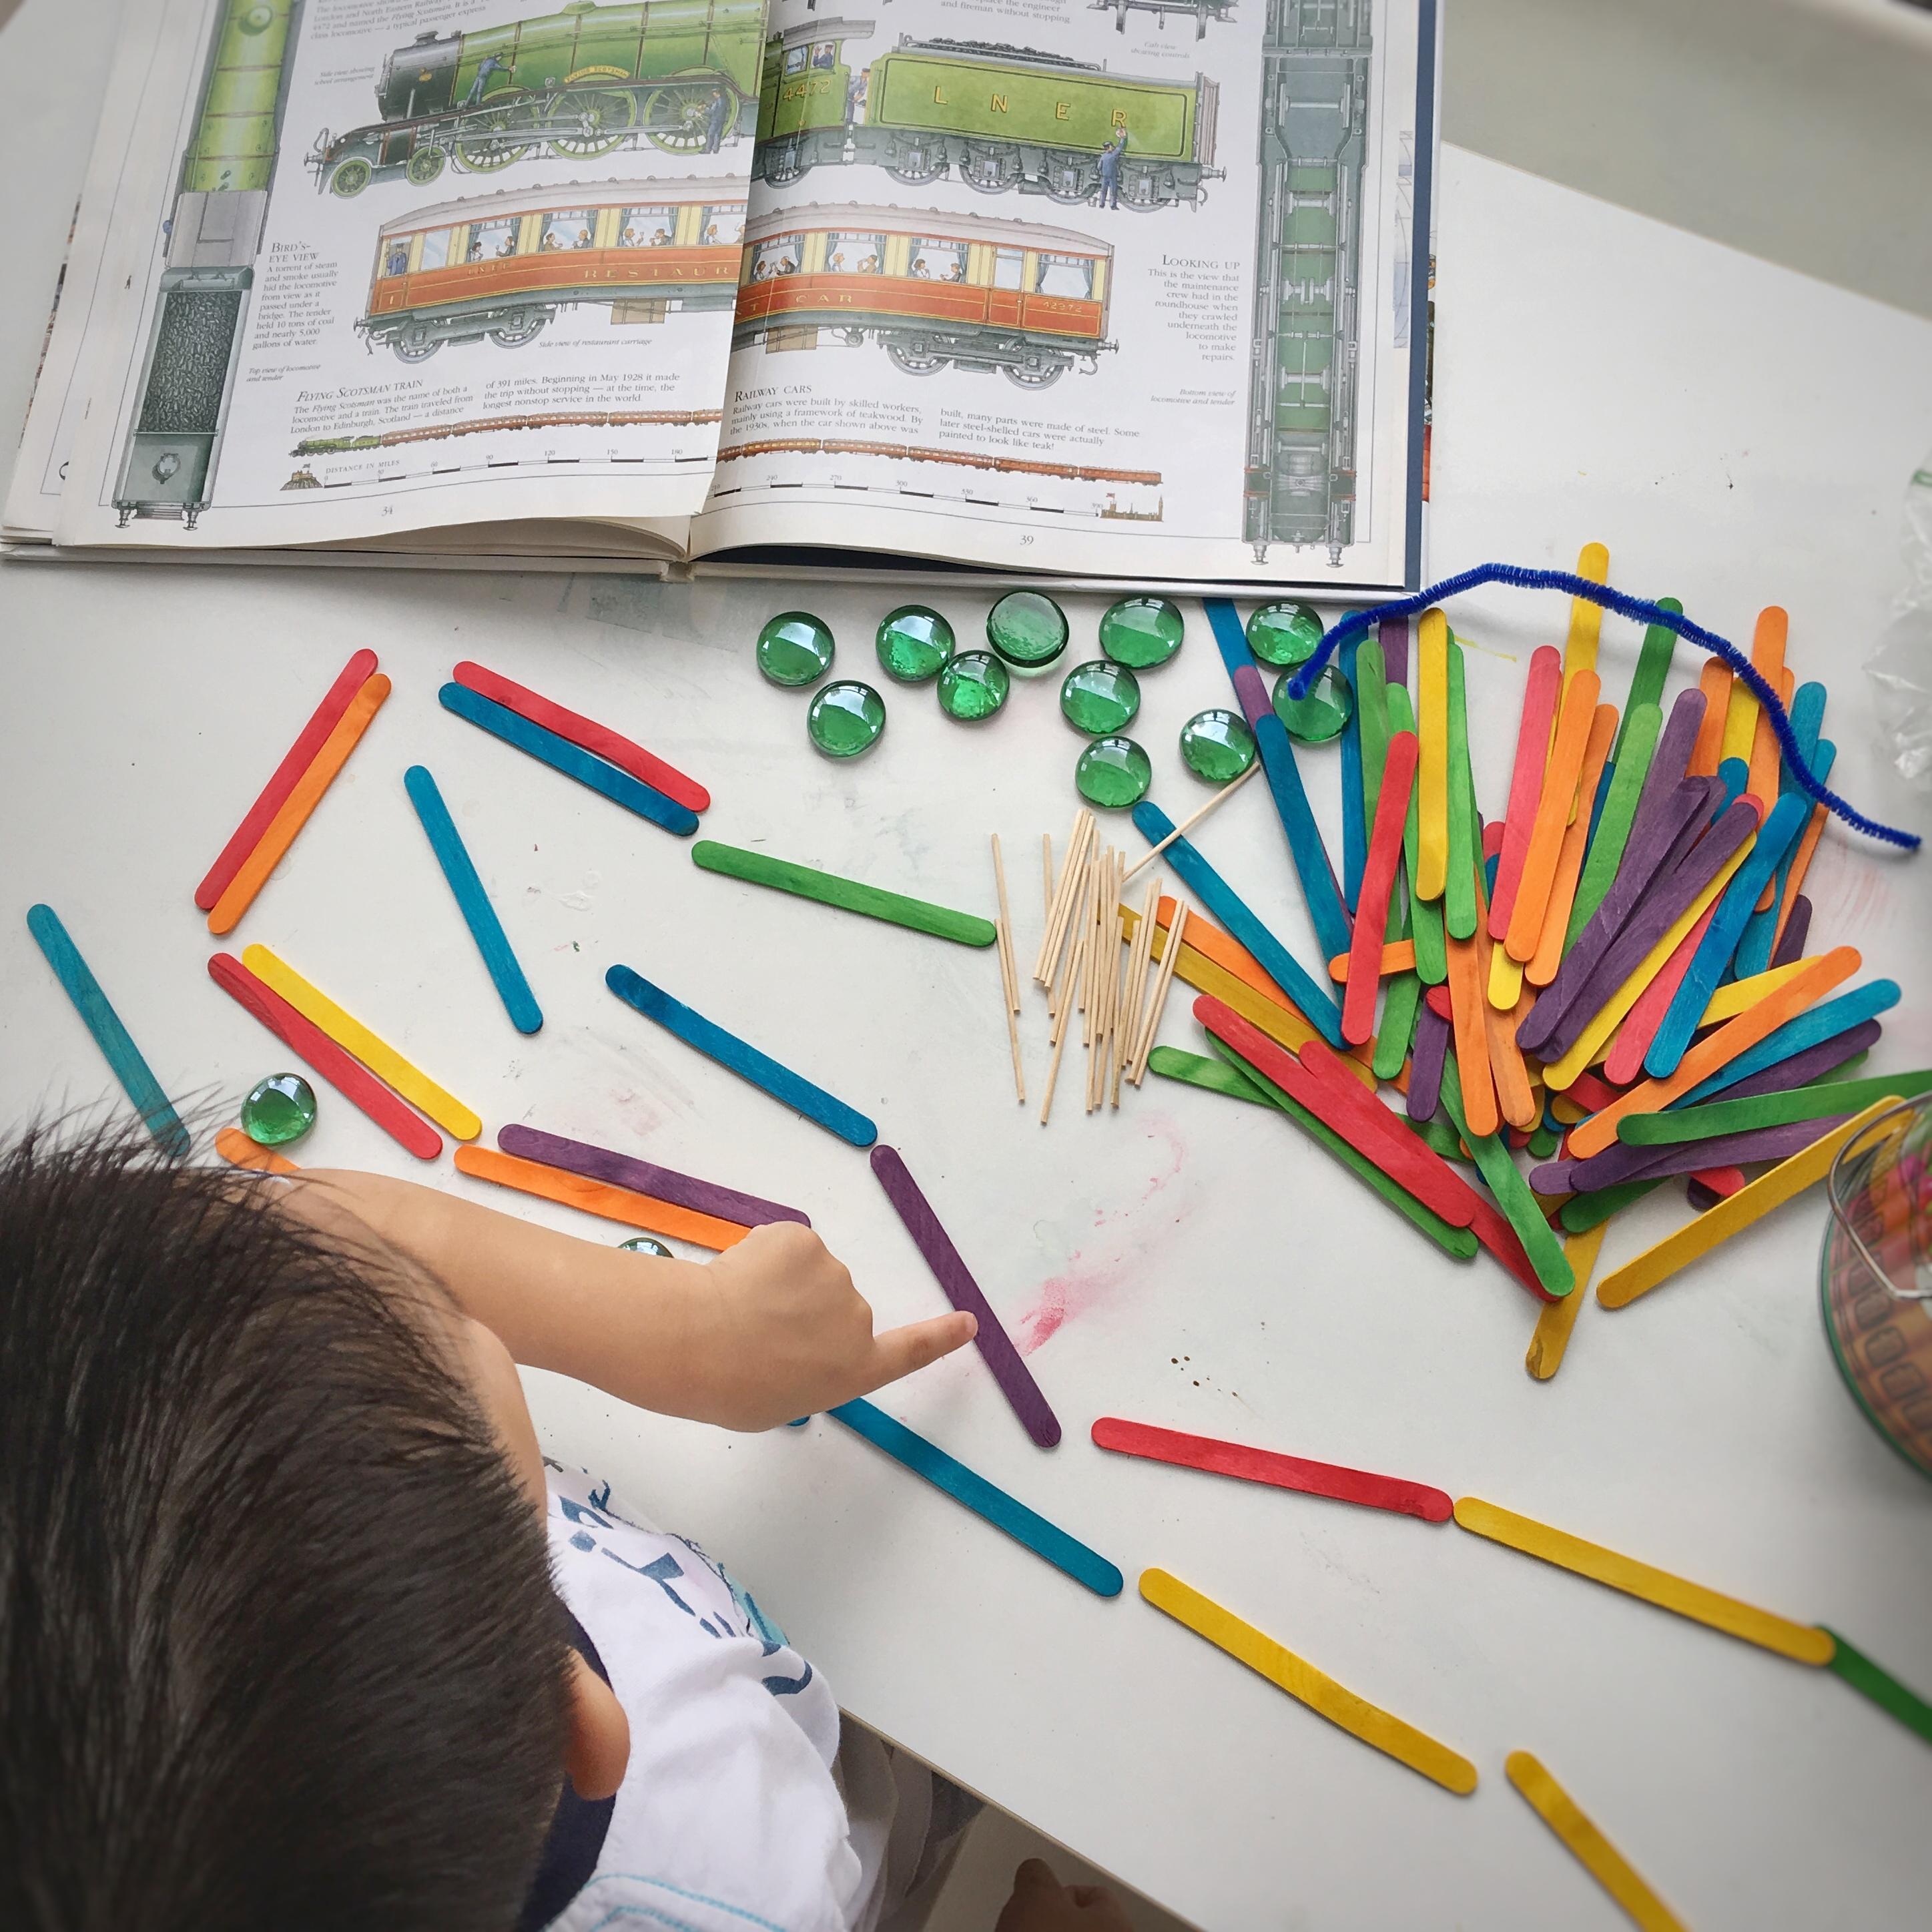 Stimulasi Untuk Batita Usia 0 3 Tahun – IndonesiaMontessori – global education for Indonesian parents and children